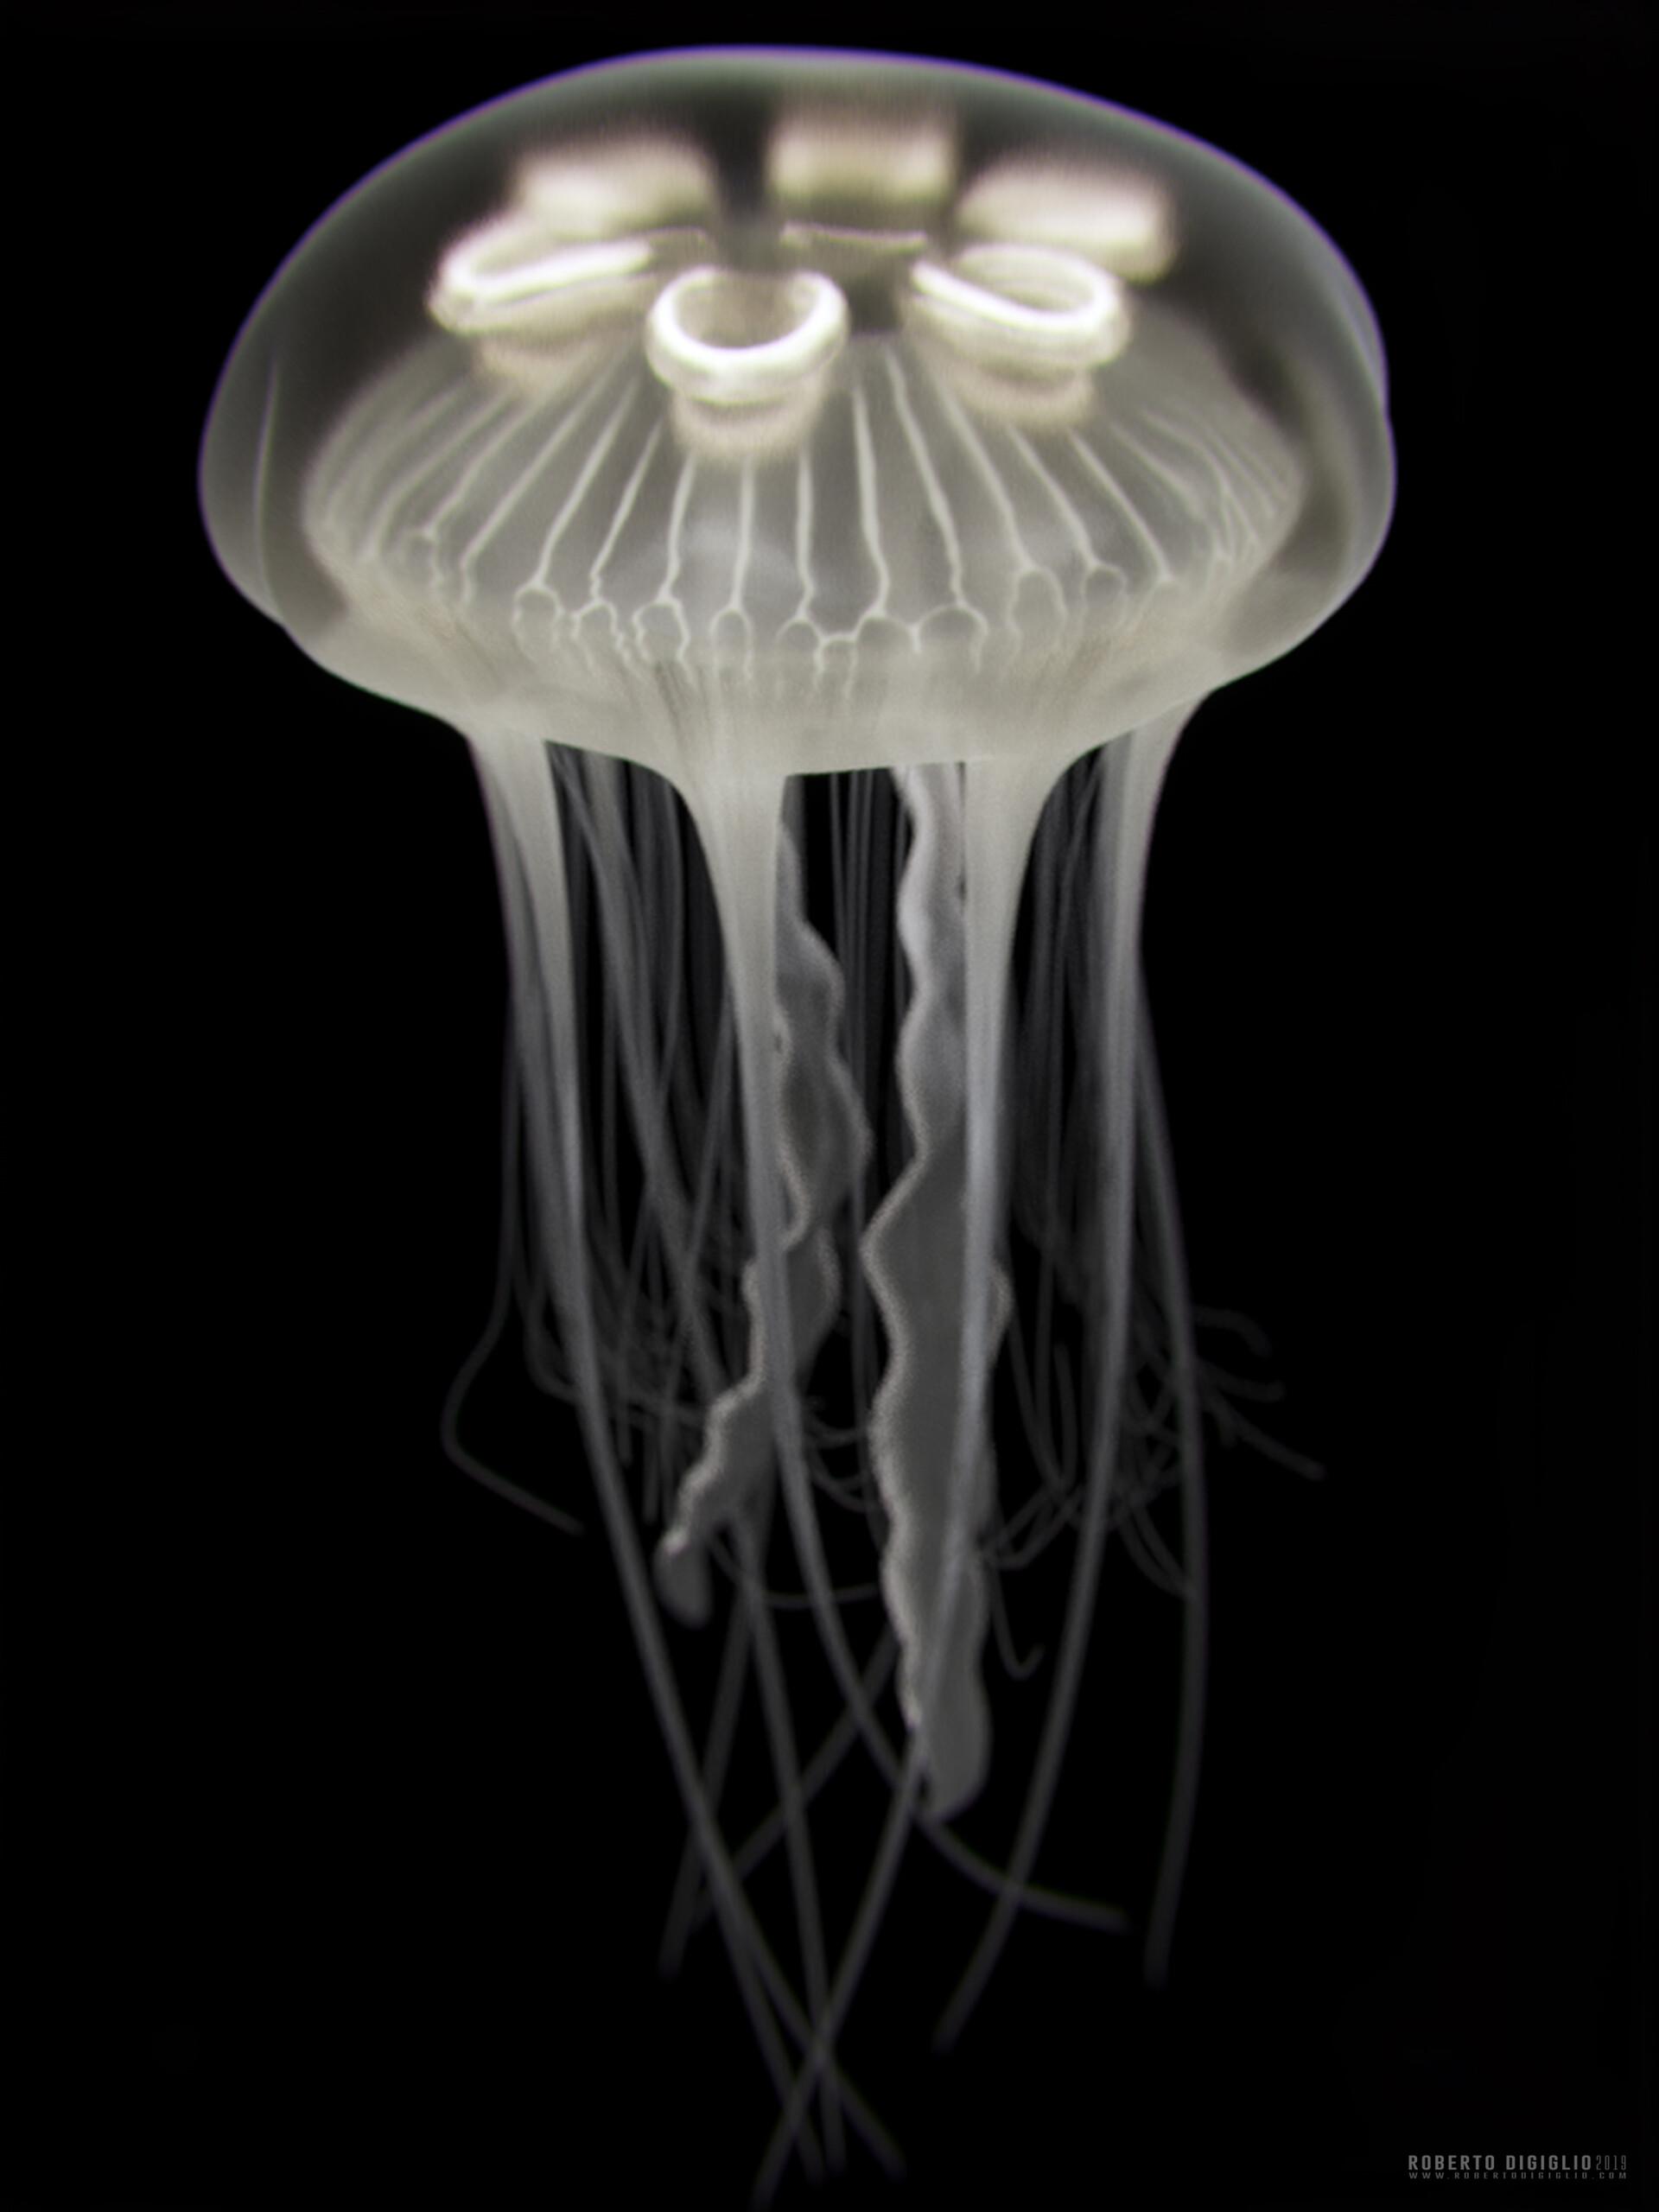 Roberto digiglio jellyfish2